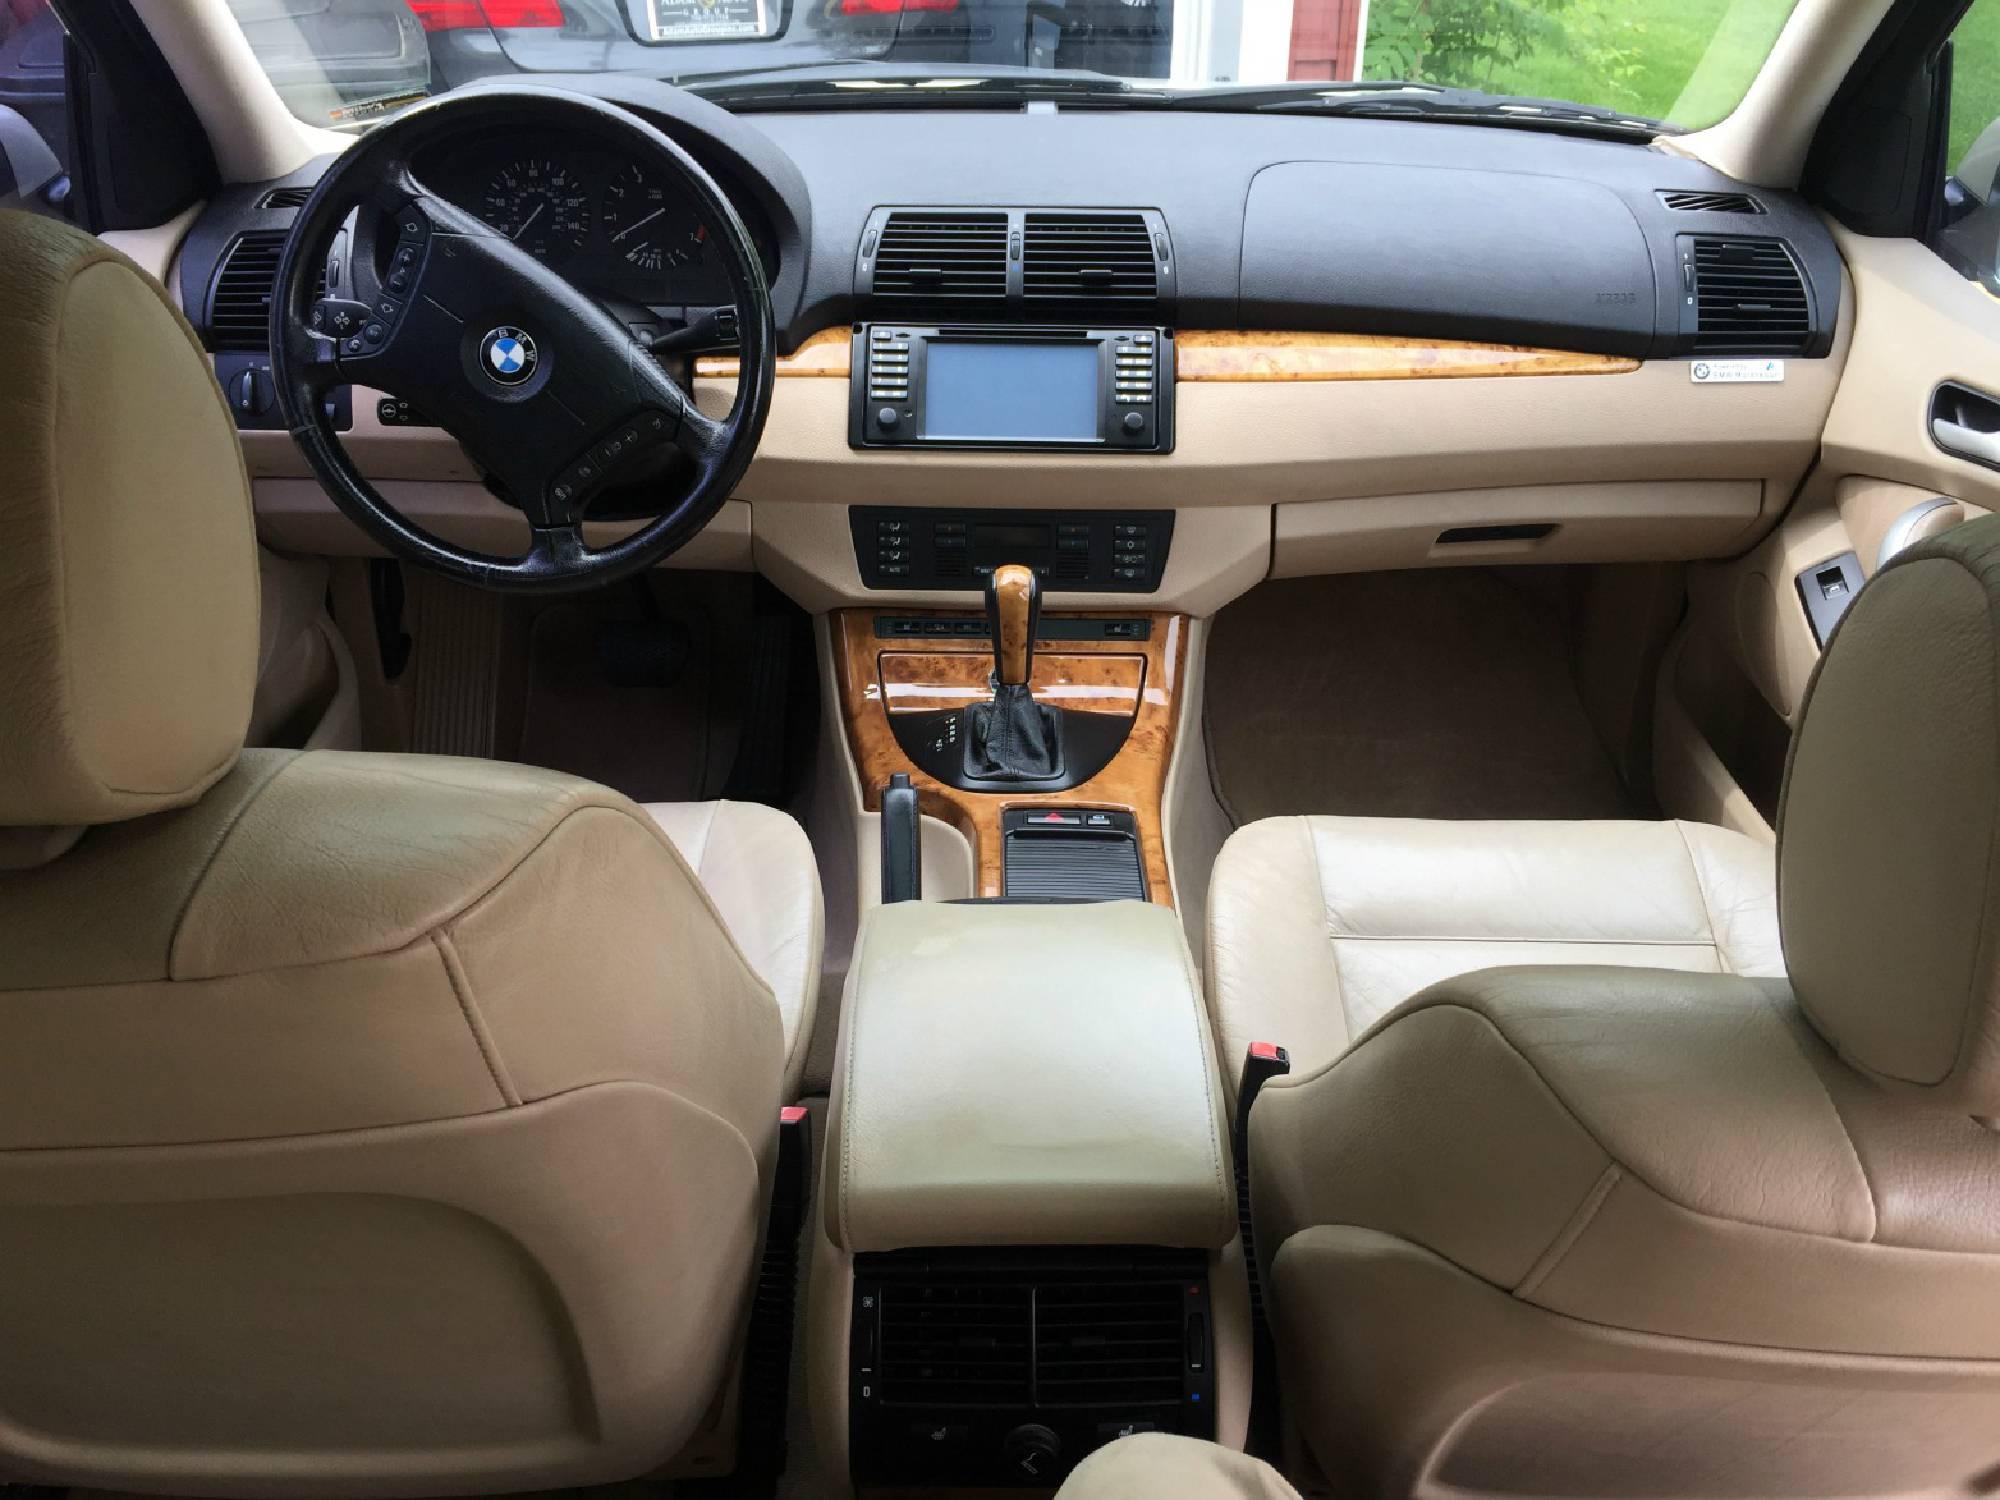 union ky car detailing mobile auto detailing service. Black Bedroom Furniture Sets. Home Design Ideas